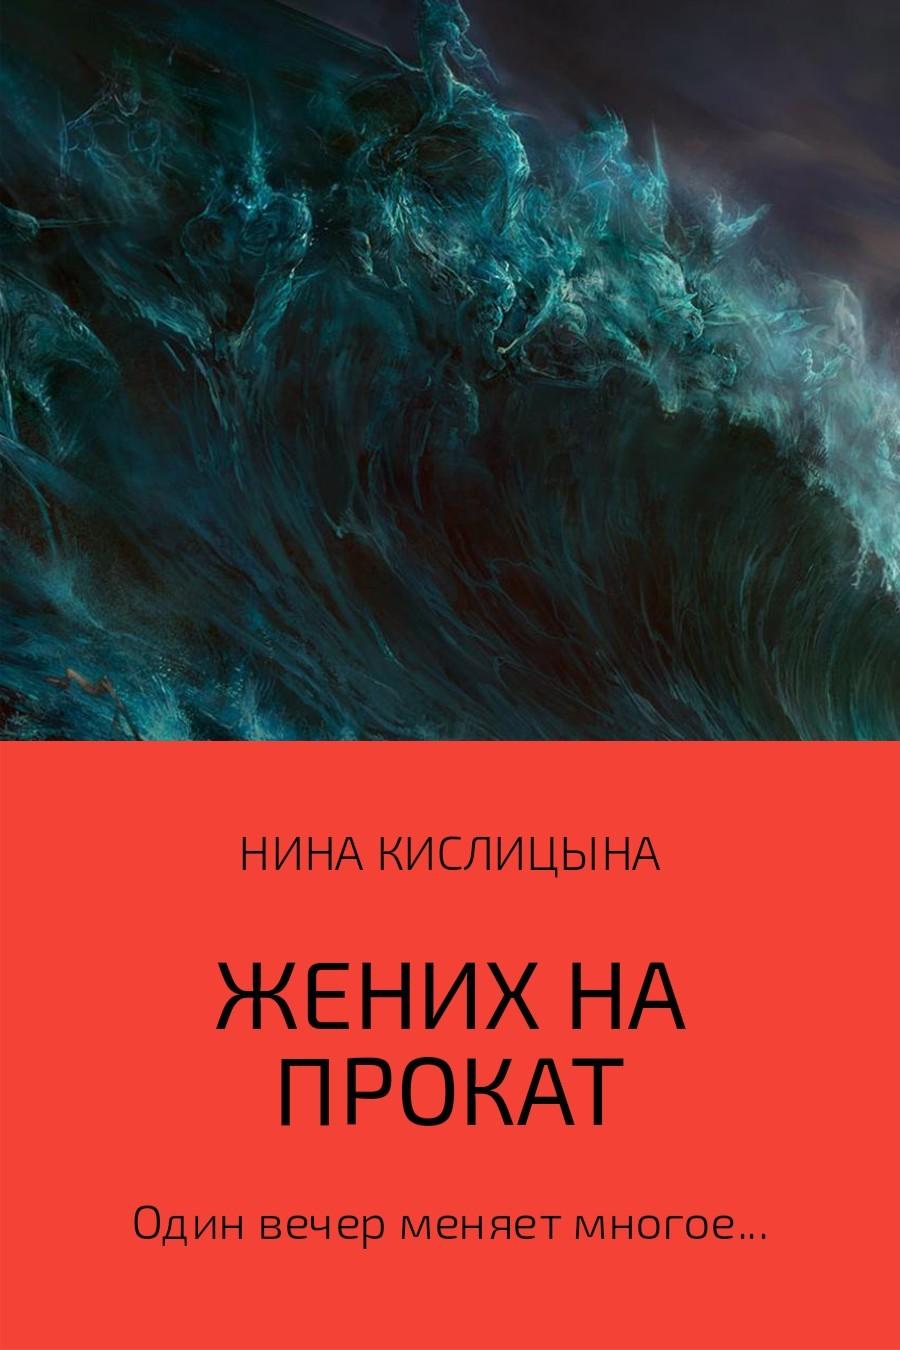 Нина Кислицына Жених на прокат ирина ротт прикольные шапочки за один вечер